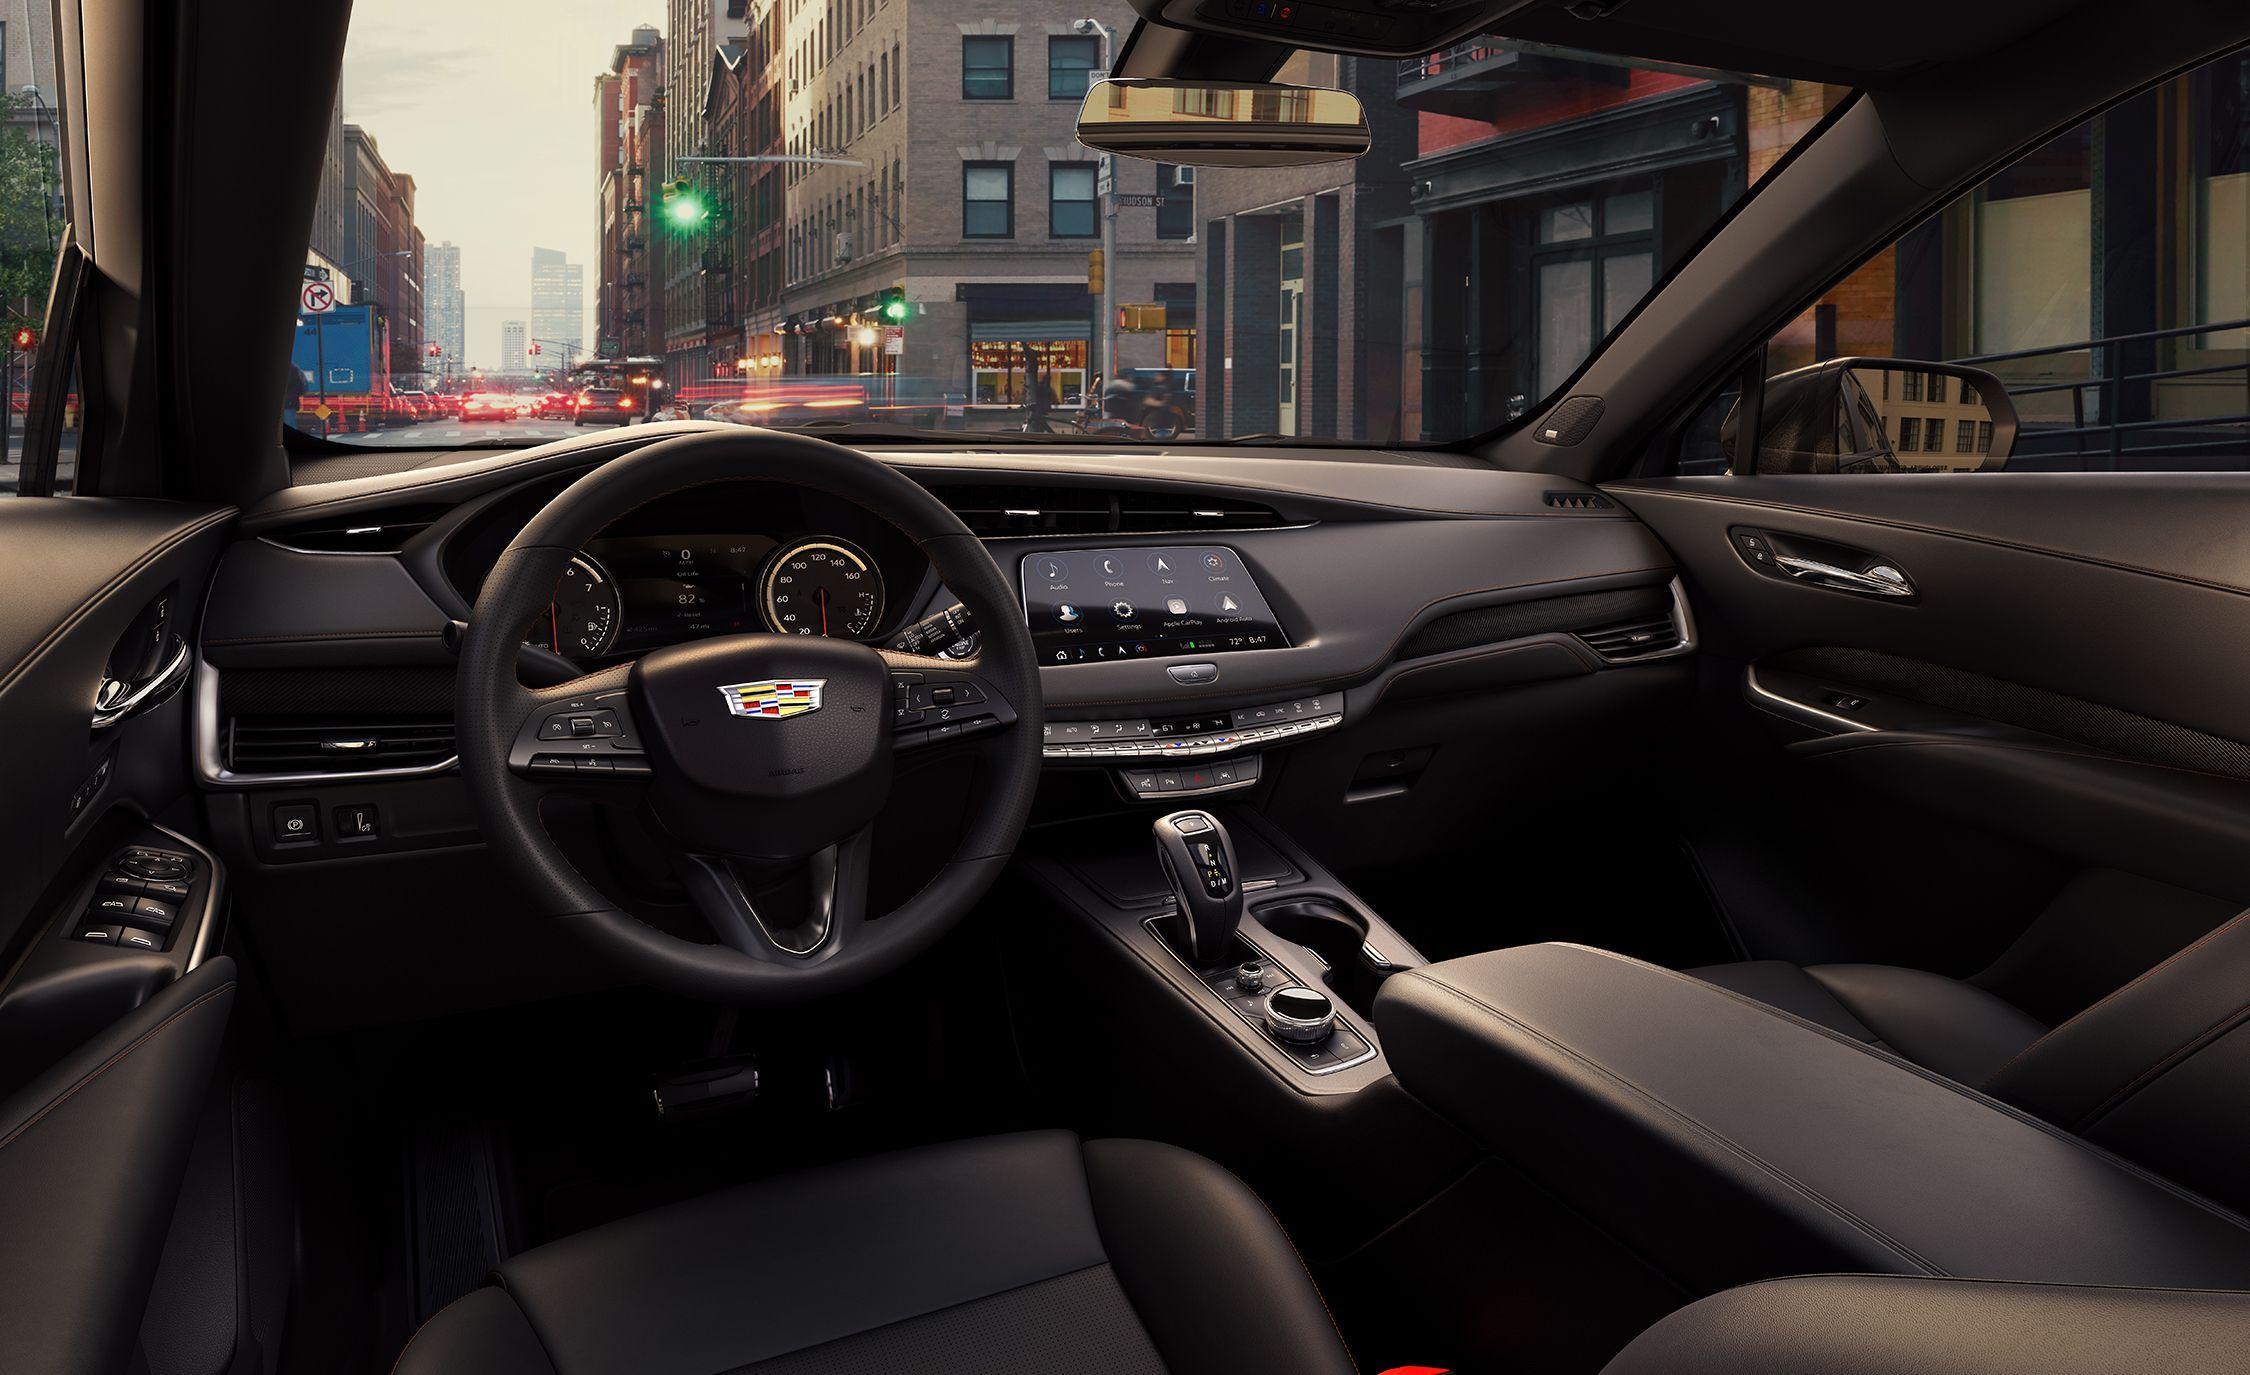 2019 Cadillac Xt4 Reviews Cadillac Xt4 Price Photos And Specs